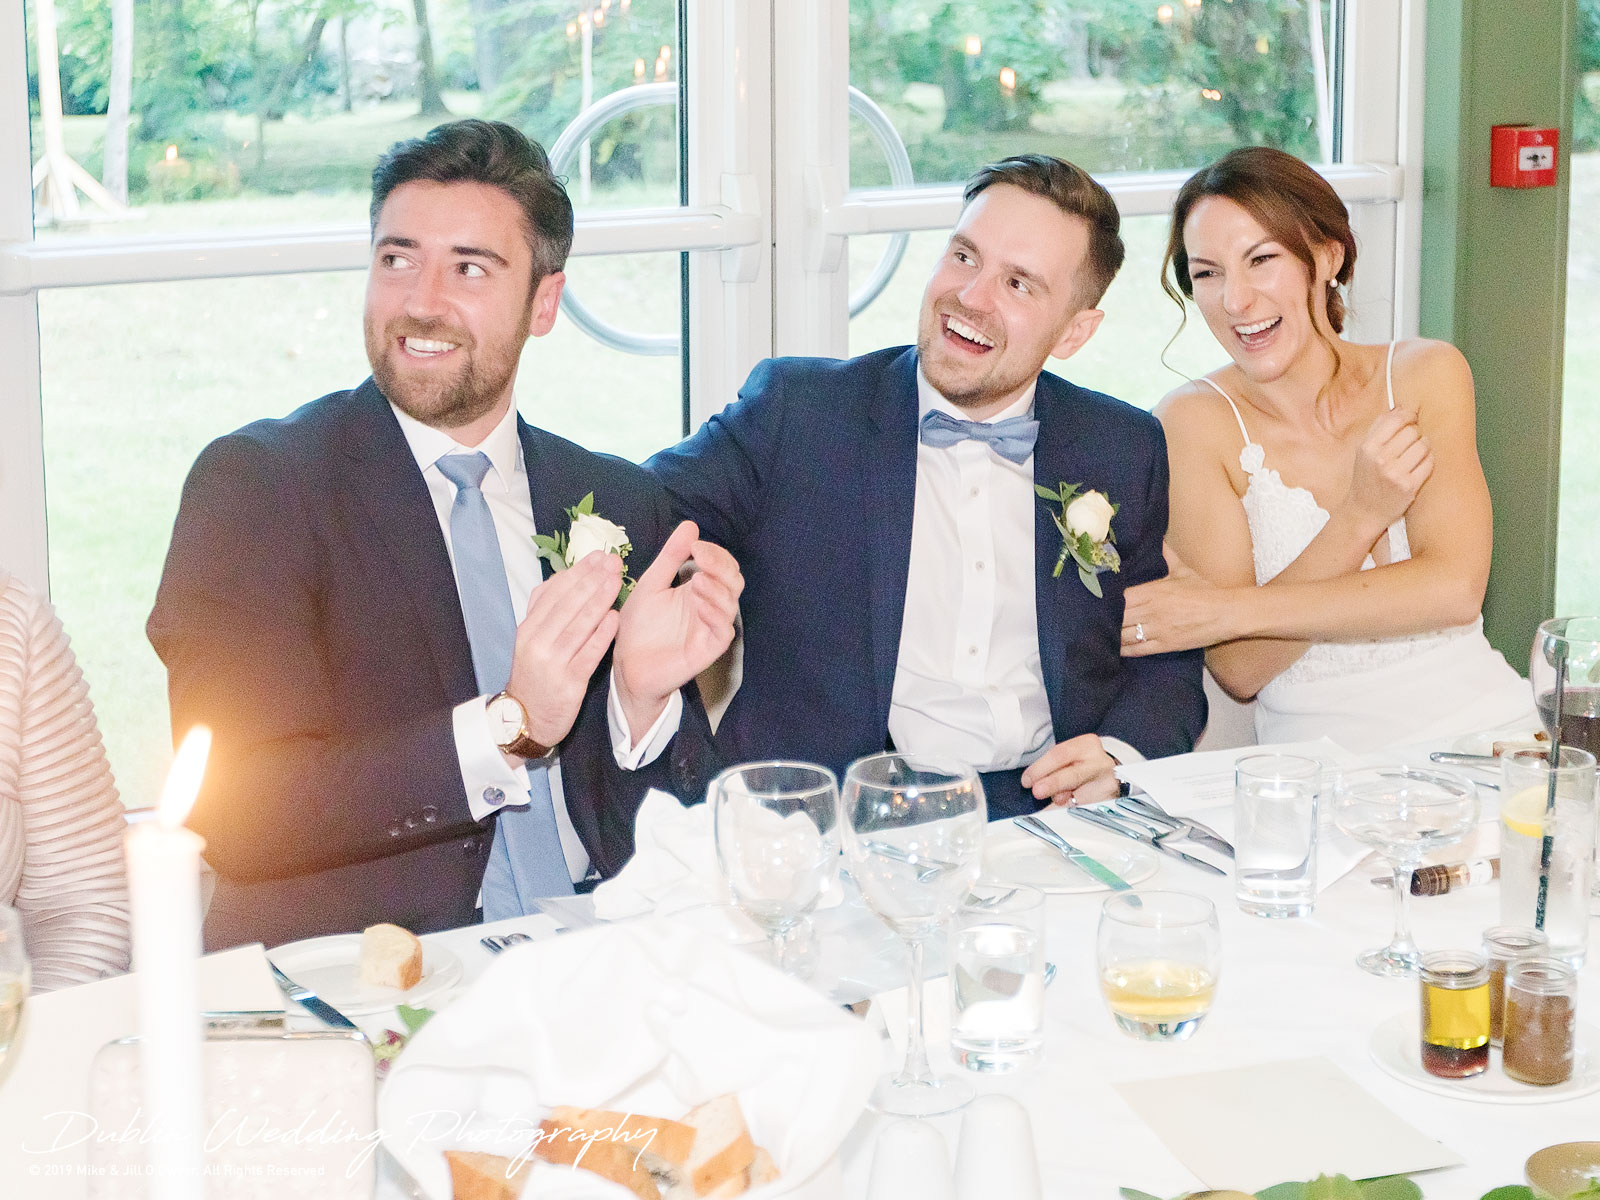 wedding-photographers-wicklow-tinakilly-house-2019-71.jpg